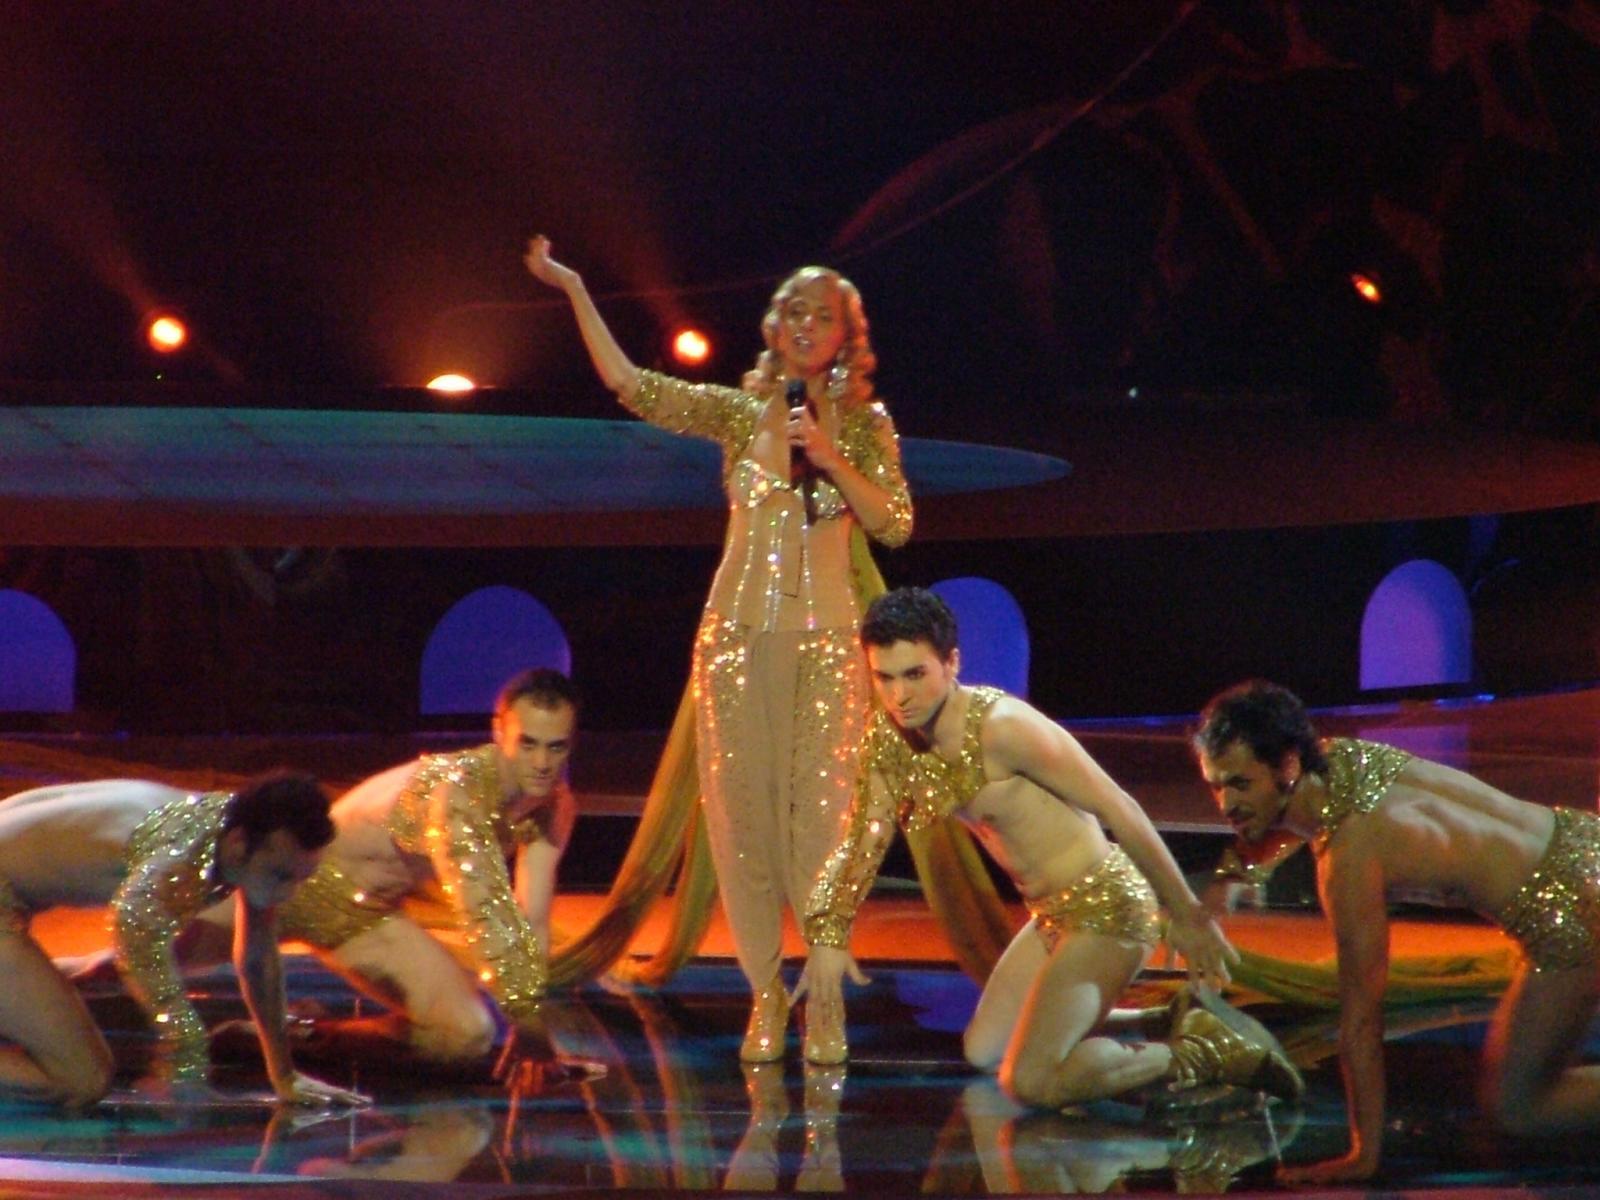 Image of Eurovision Opening Ceremony, 2004, Sertab Erener performing